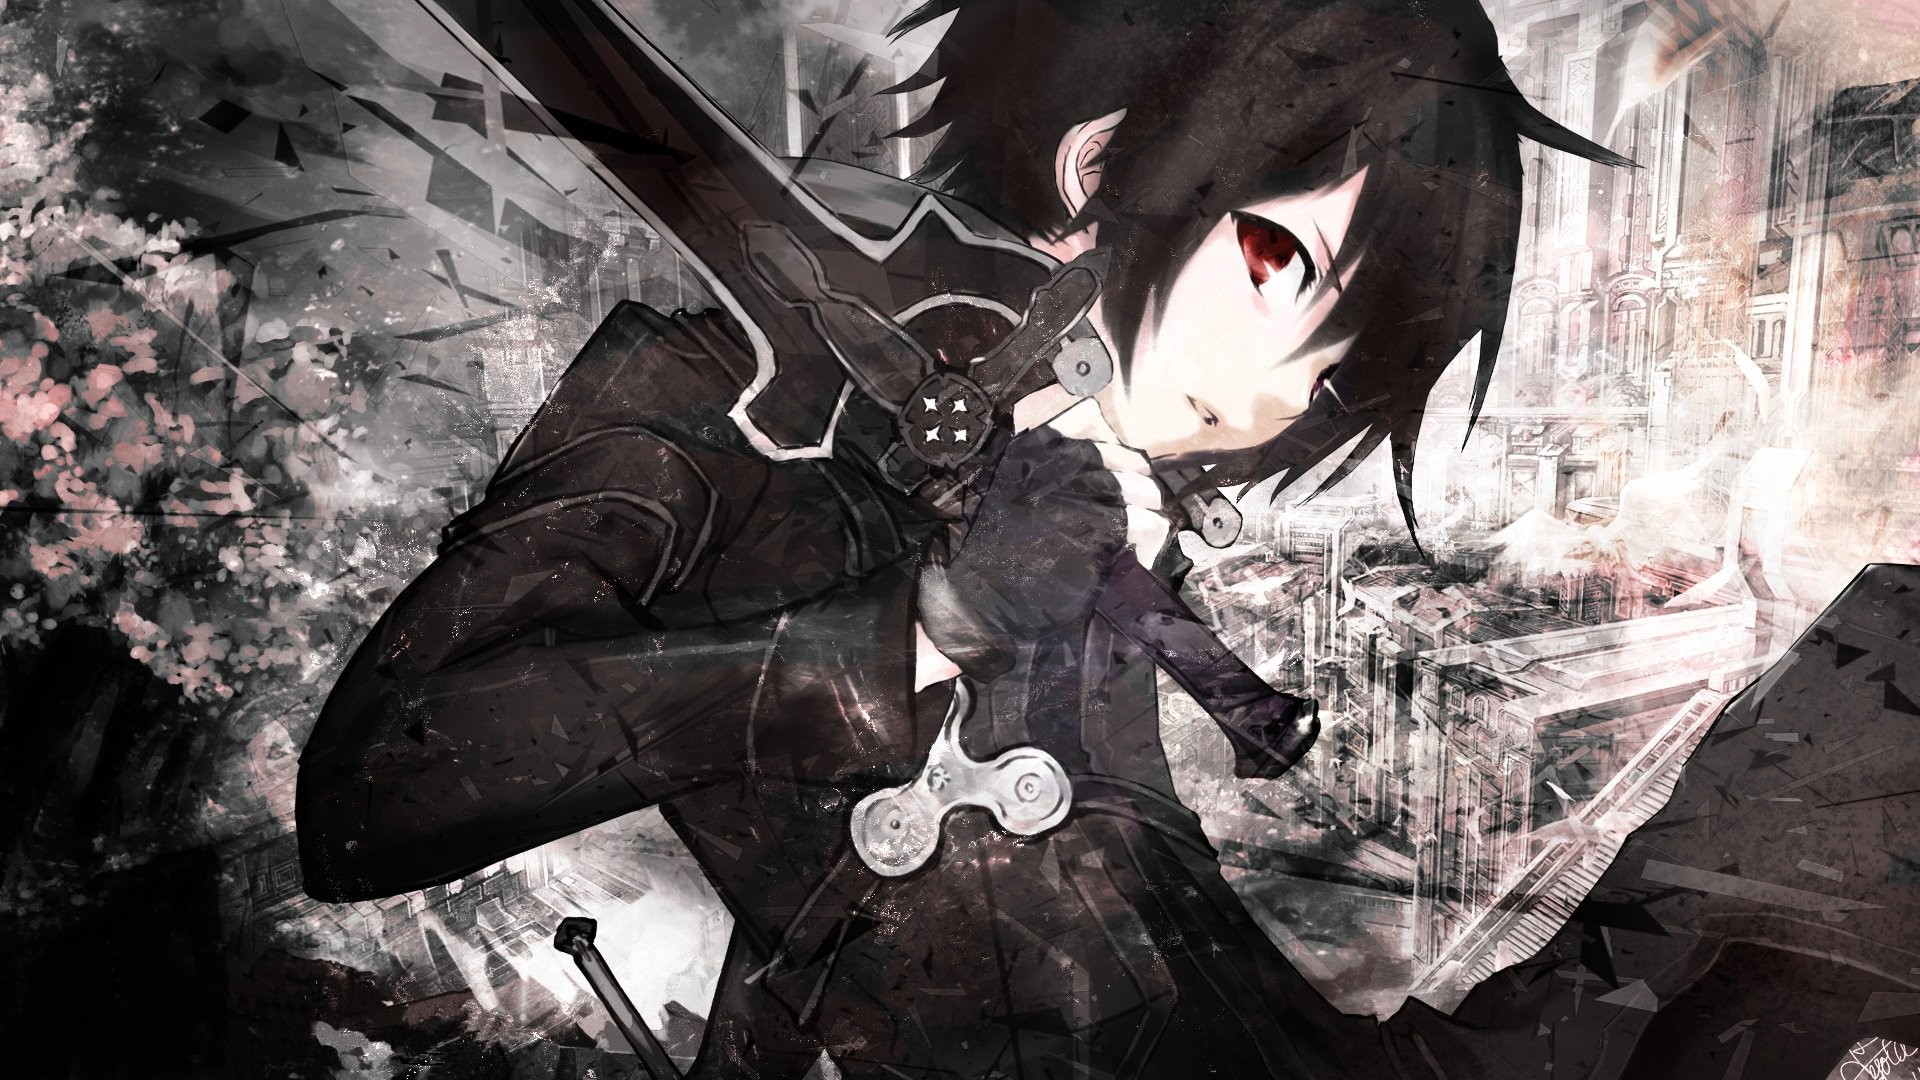 1920x1080 Black White Anime Wallpaper